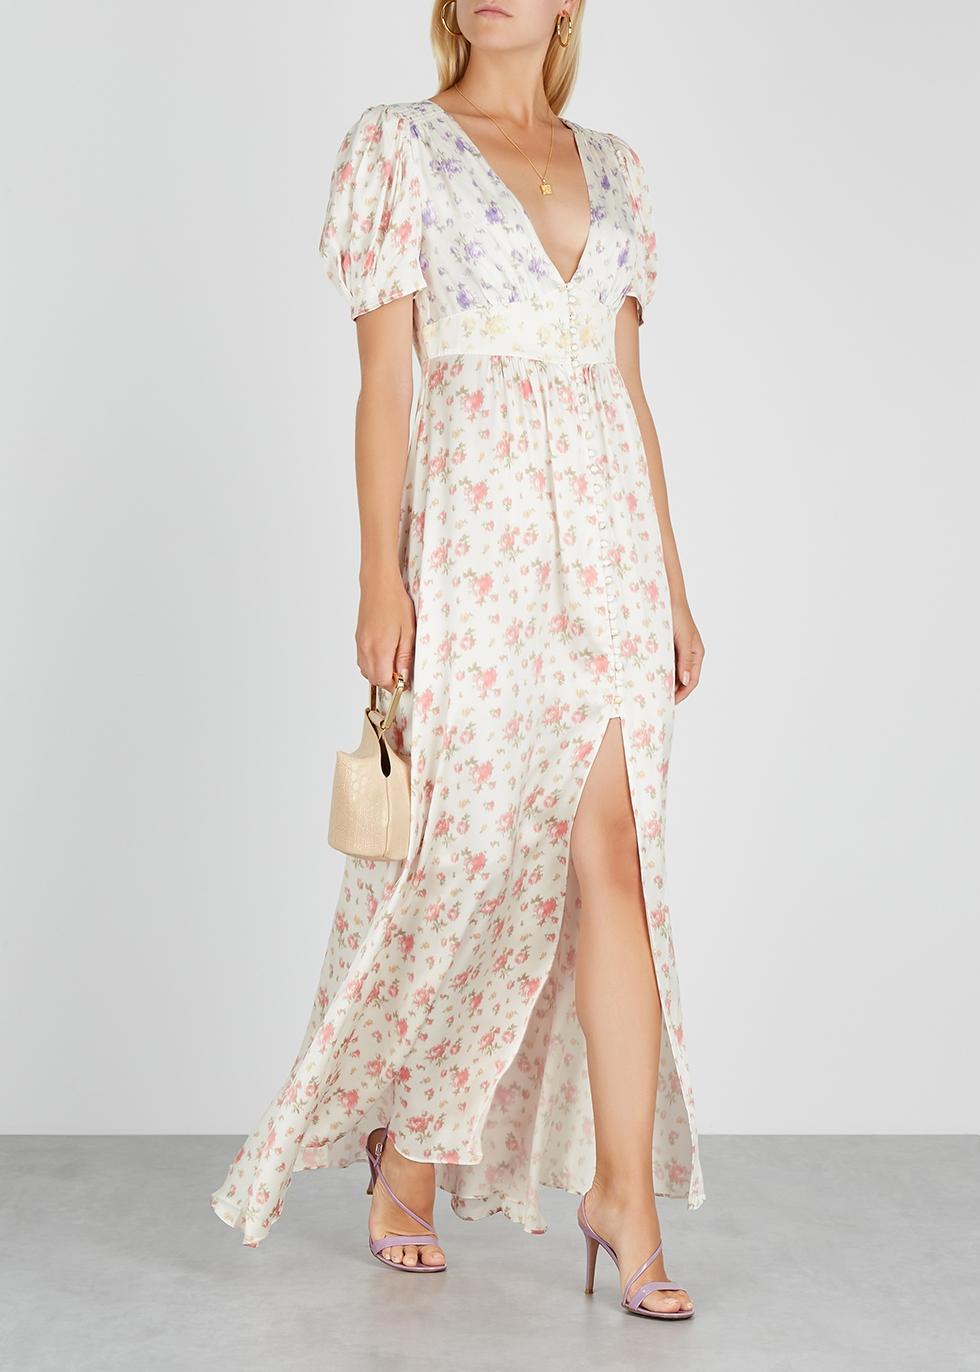 fd39f76a84 Women's Designer Clothing, Shoes and Bags - Harvey Nichols